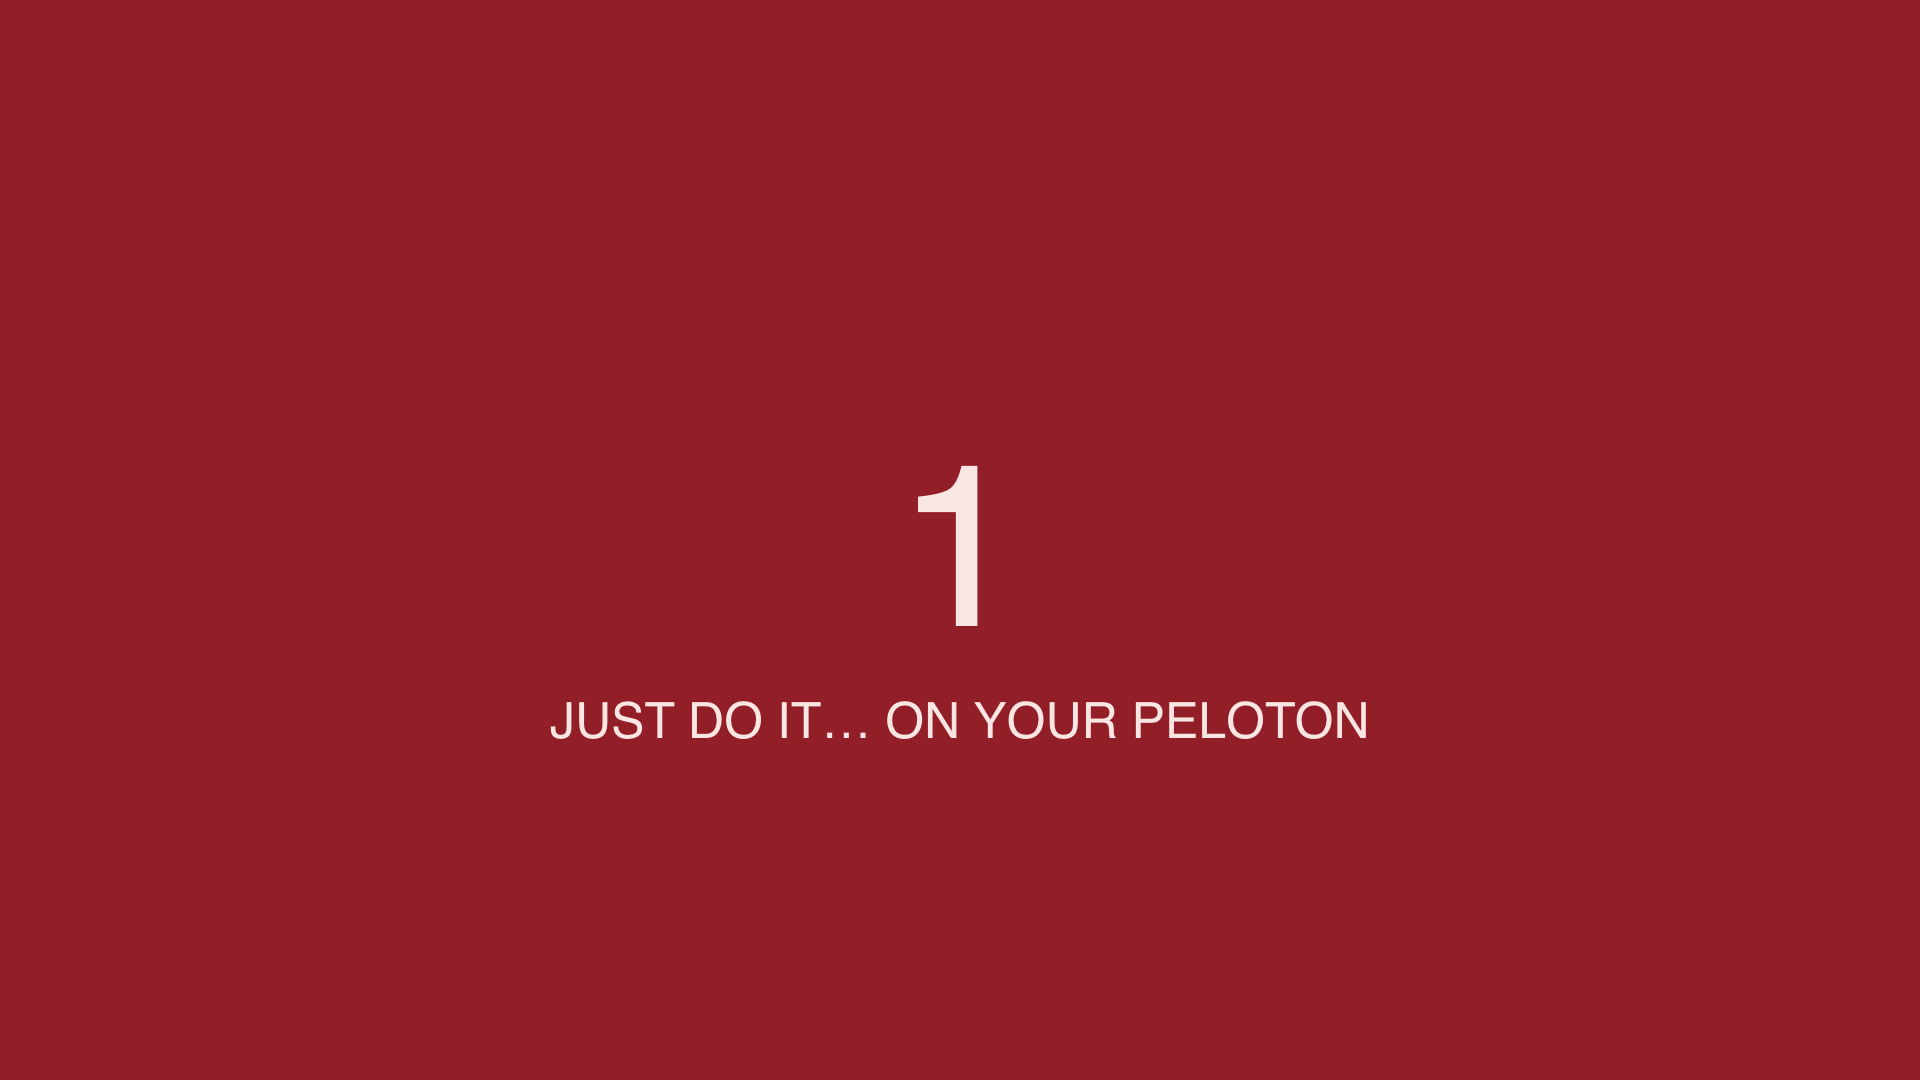 Peloton Brand Campaign Jonah.031.jpeg